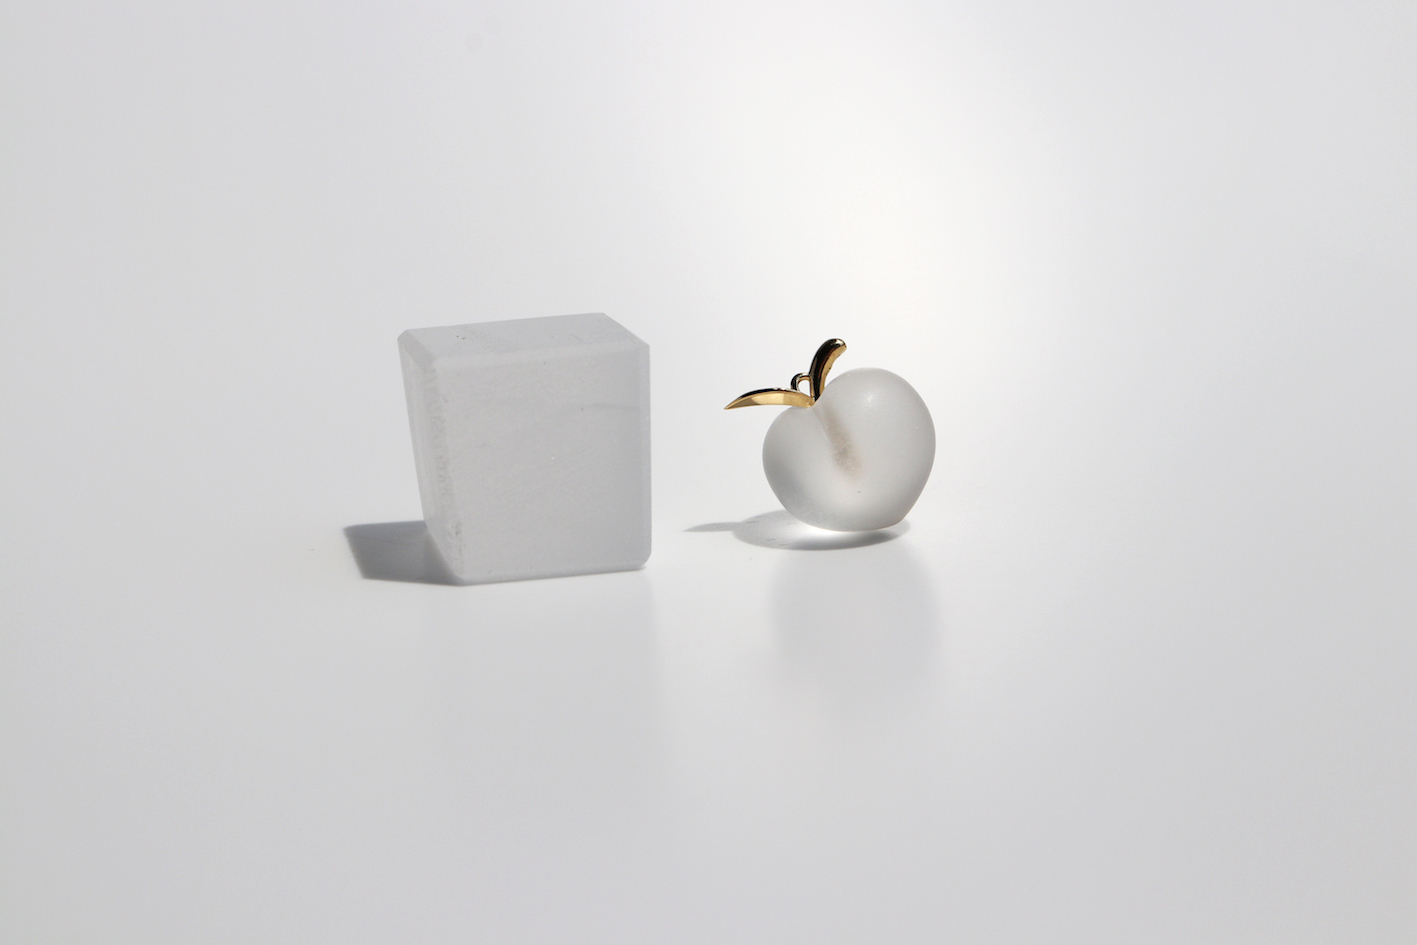 KOMI Designs フルーツモチーフアクセサリー製作秘話_c0176078_16125274.jpg